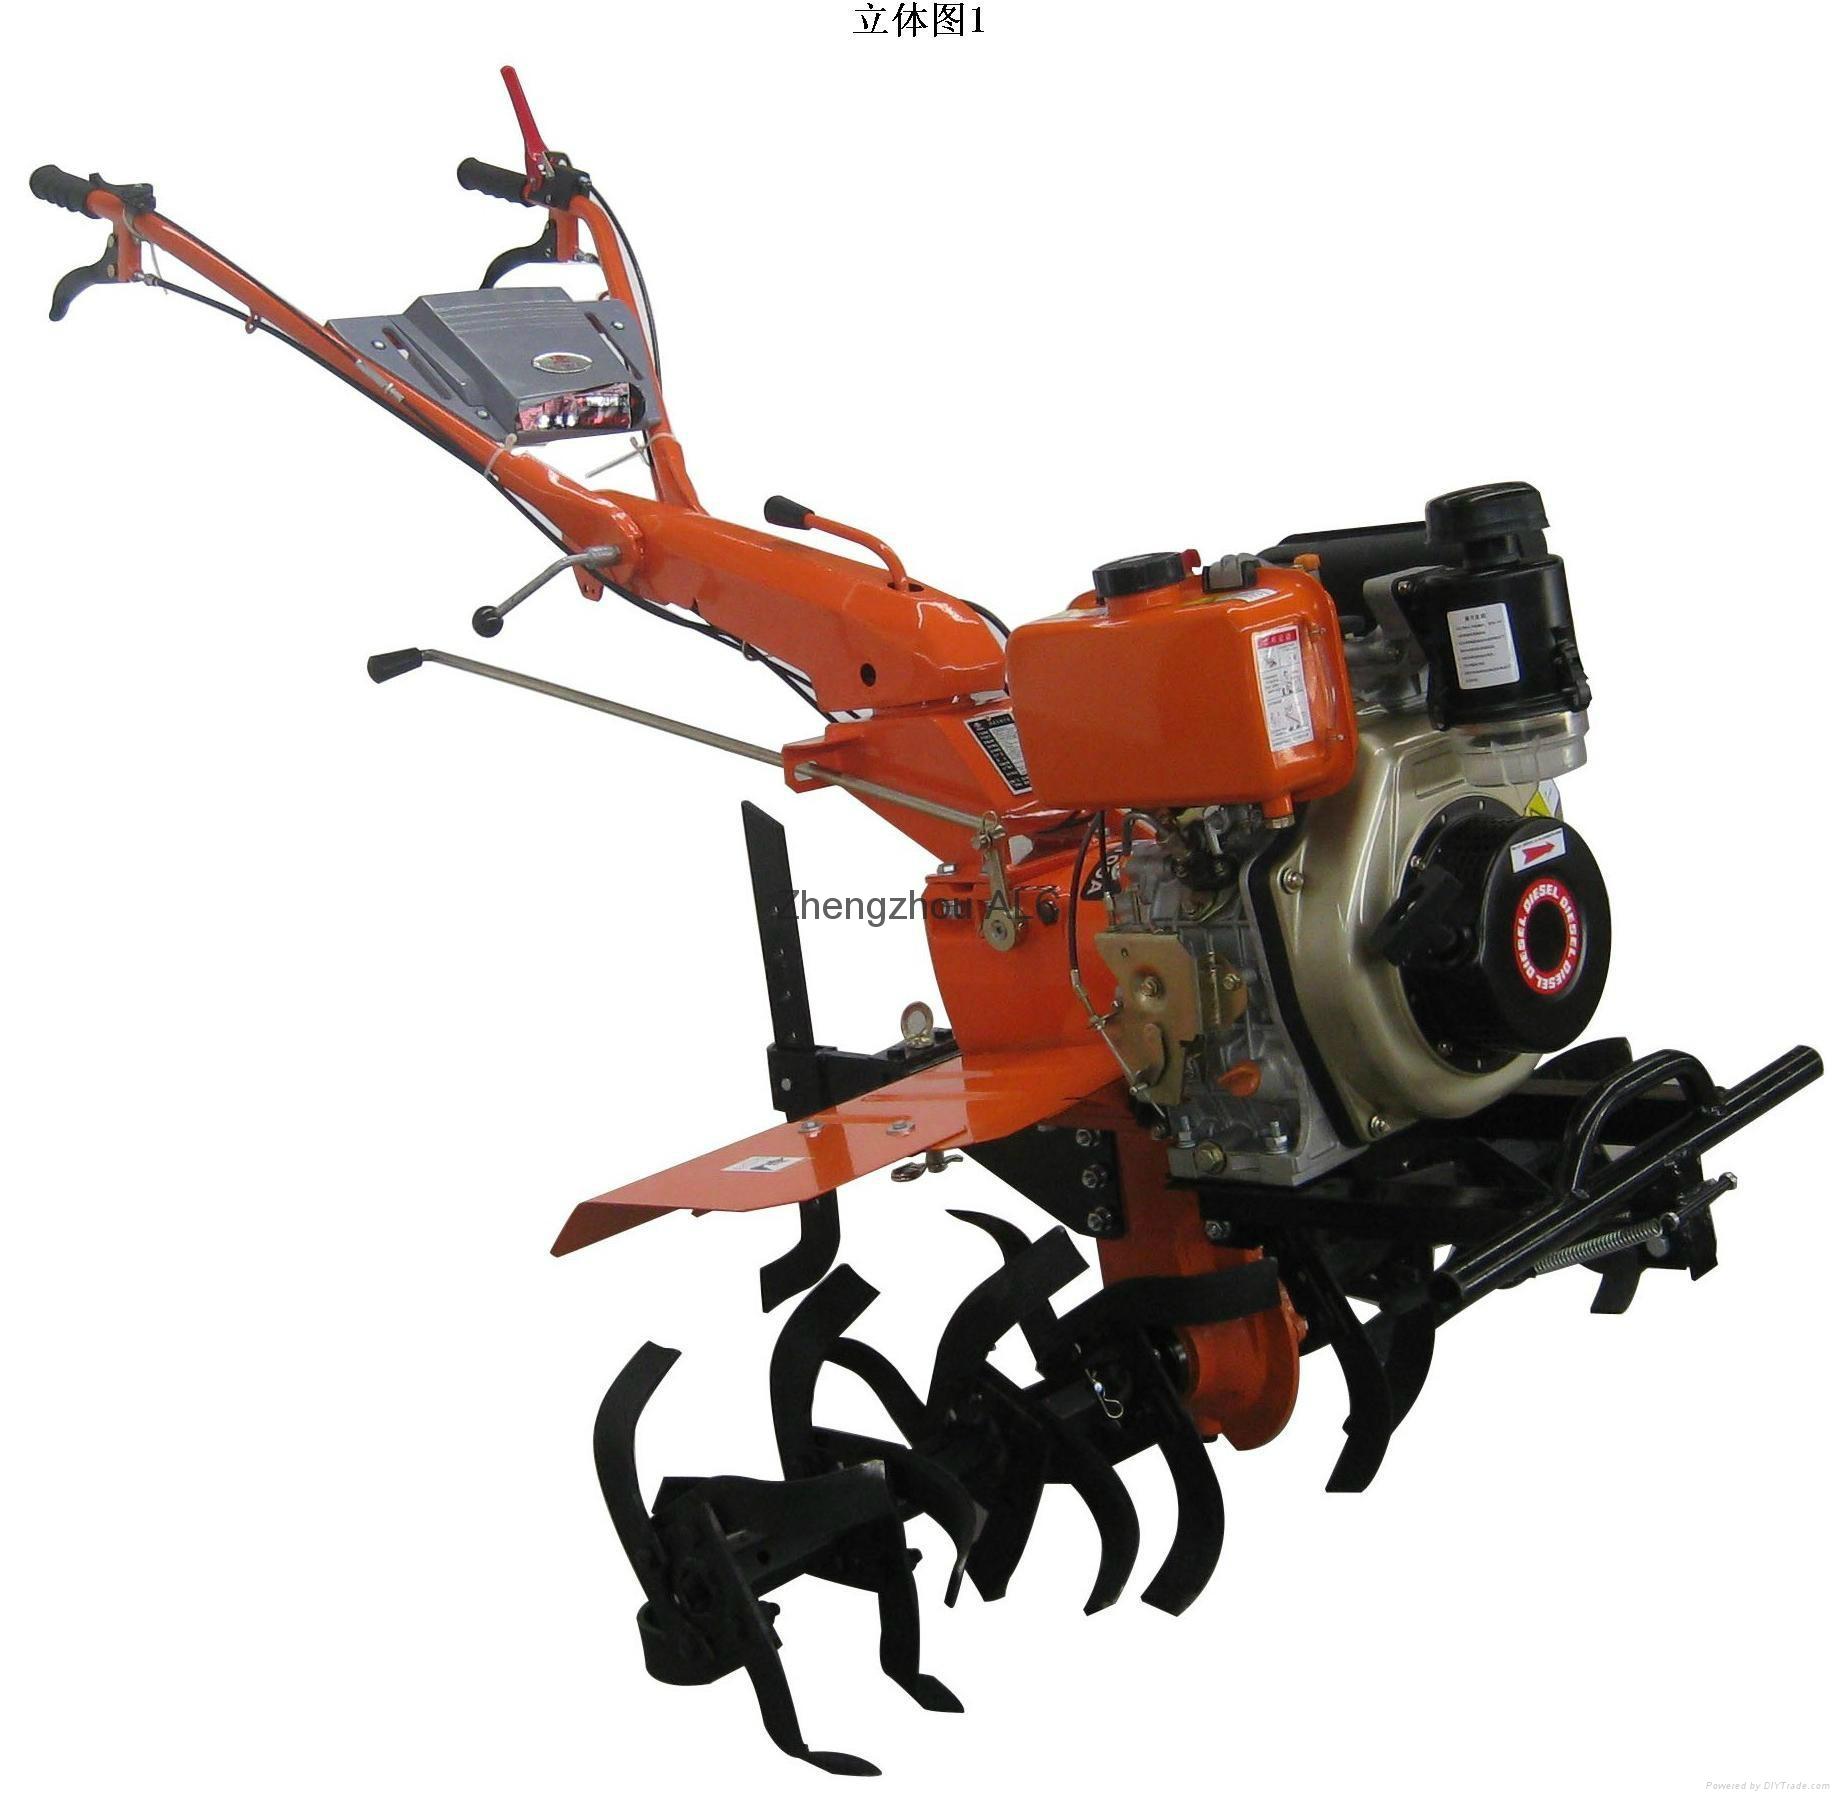 Gaosline engine power tiller agriculture machine 1